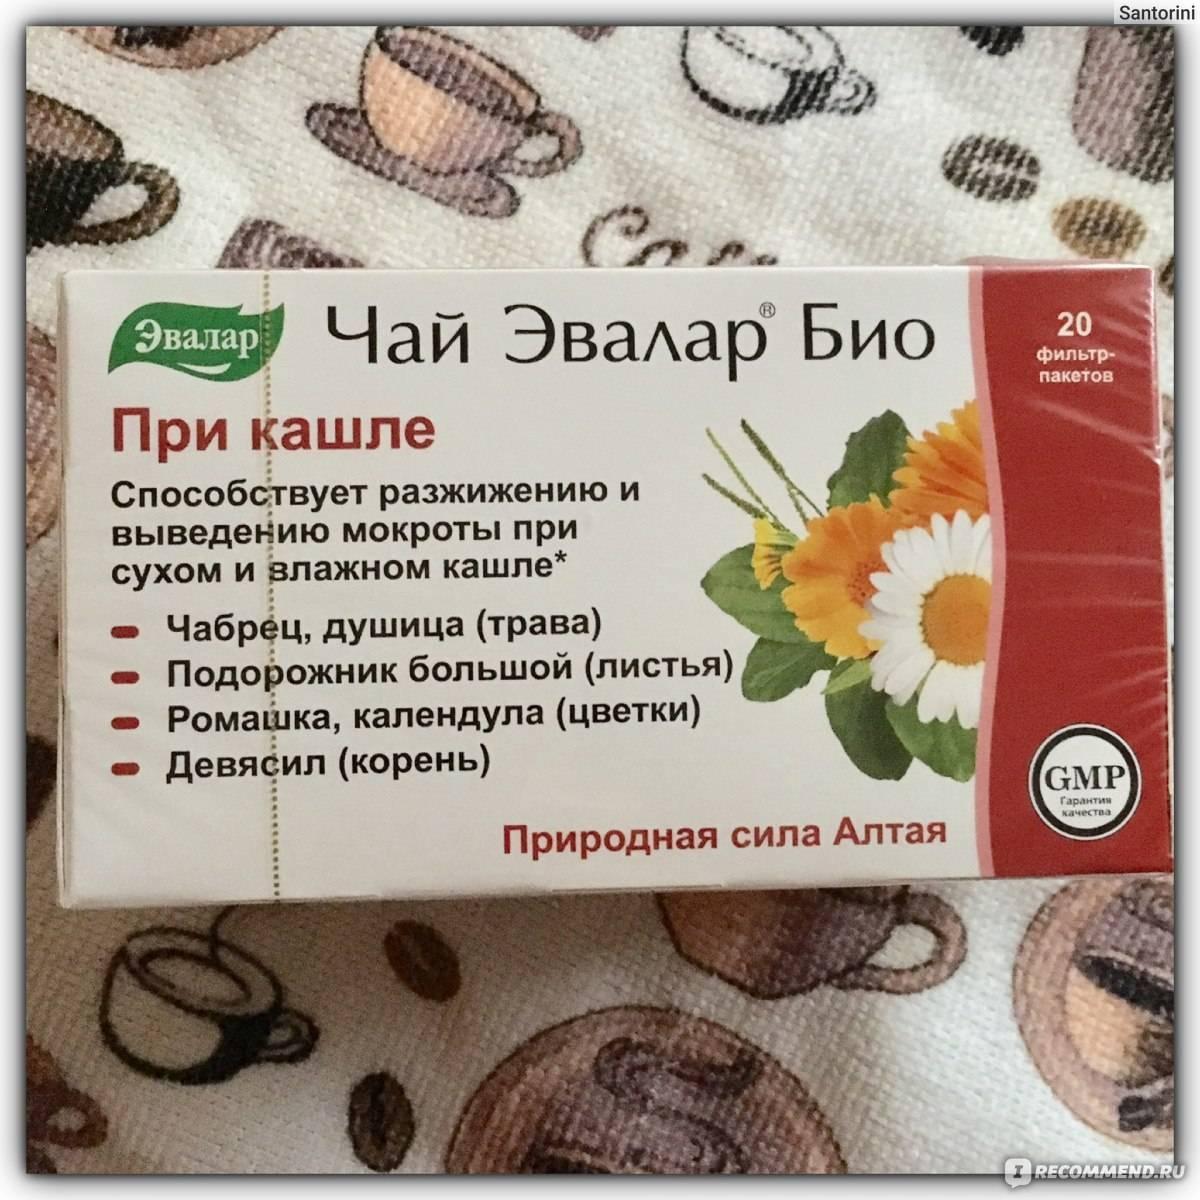 Prootvary.ru